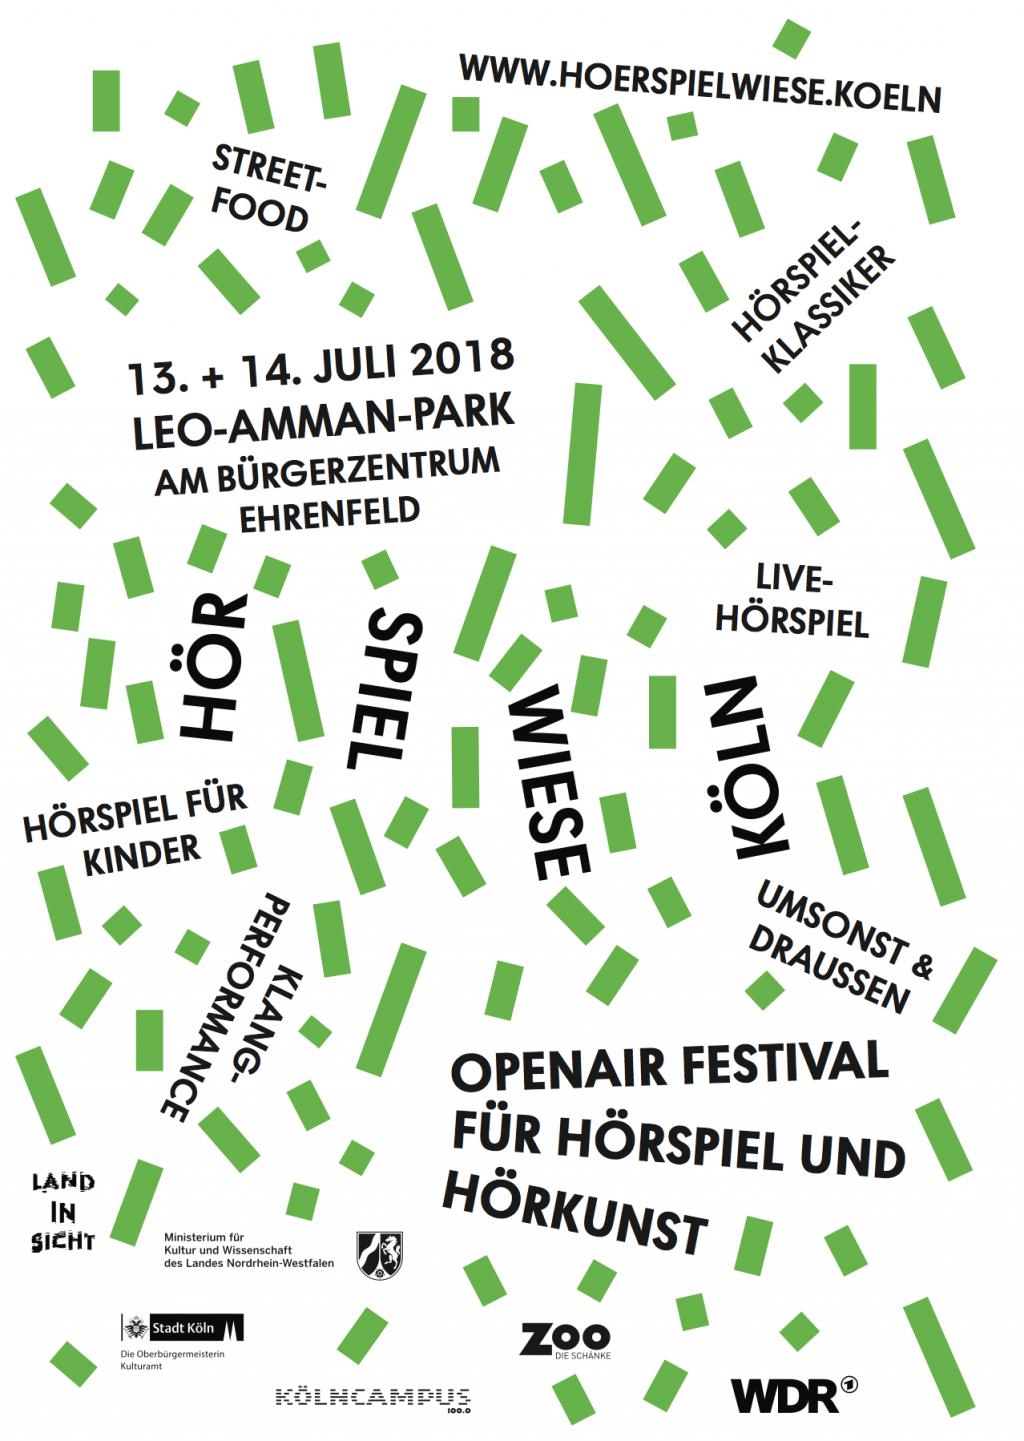 mariofrank Hörspielwiese Köln